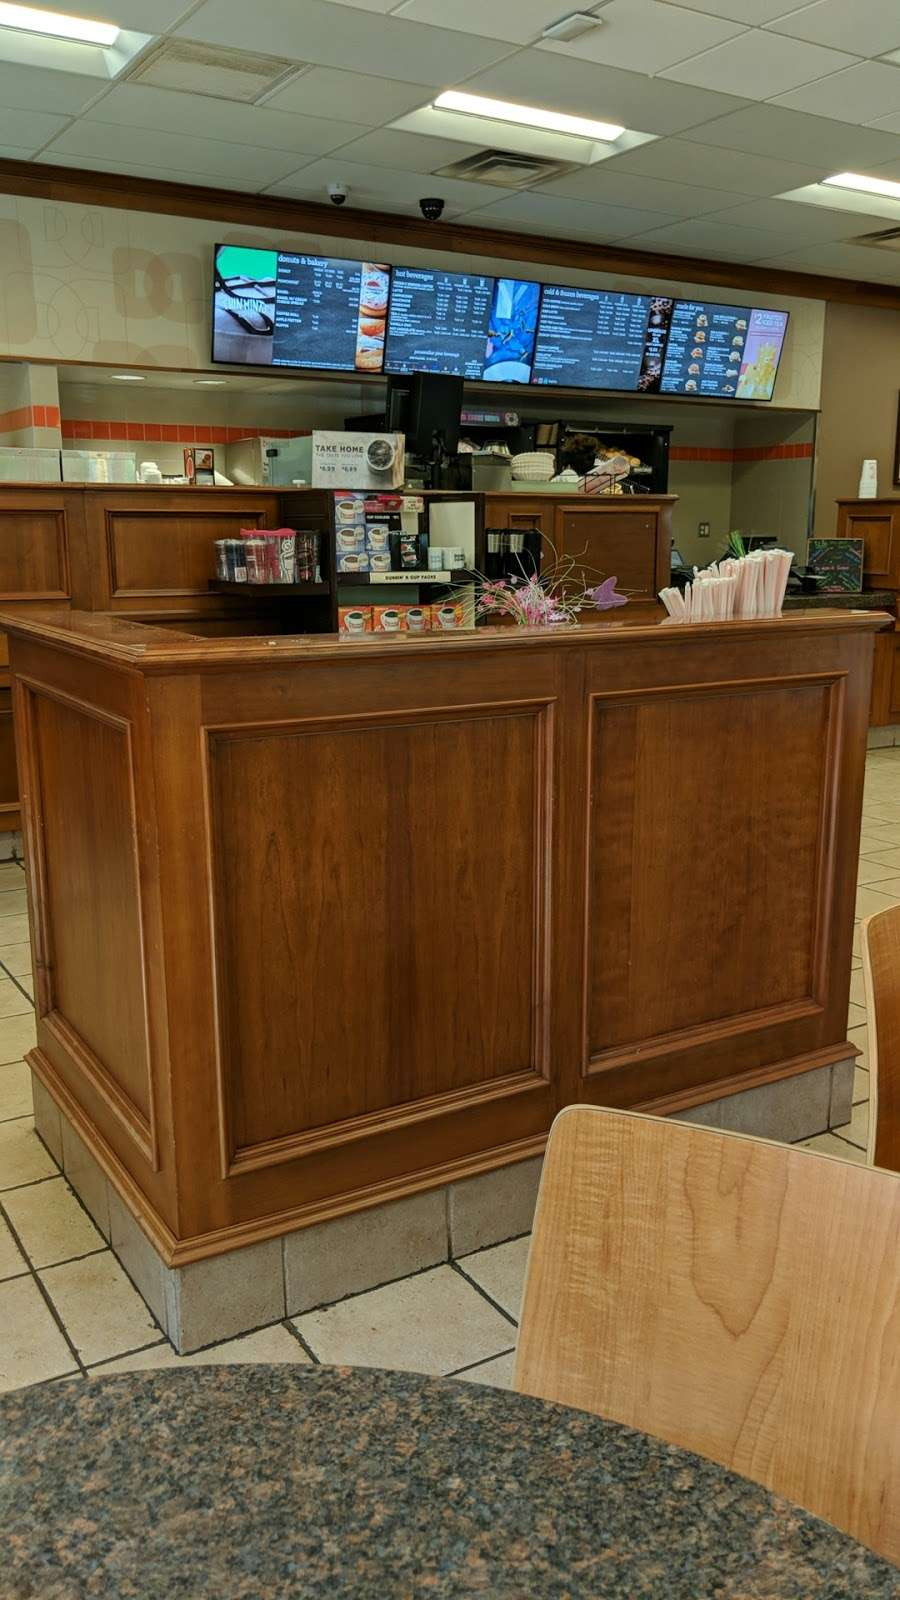 Dunkin - bakery    Photo 9 of 10   Address: 1452 Broncos Hwy Unit A-1, Burrillville, RI 02826, USA   Phone: (401) 567-0172